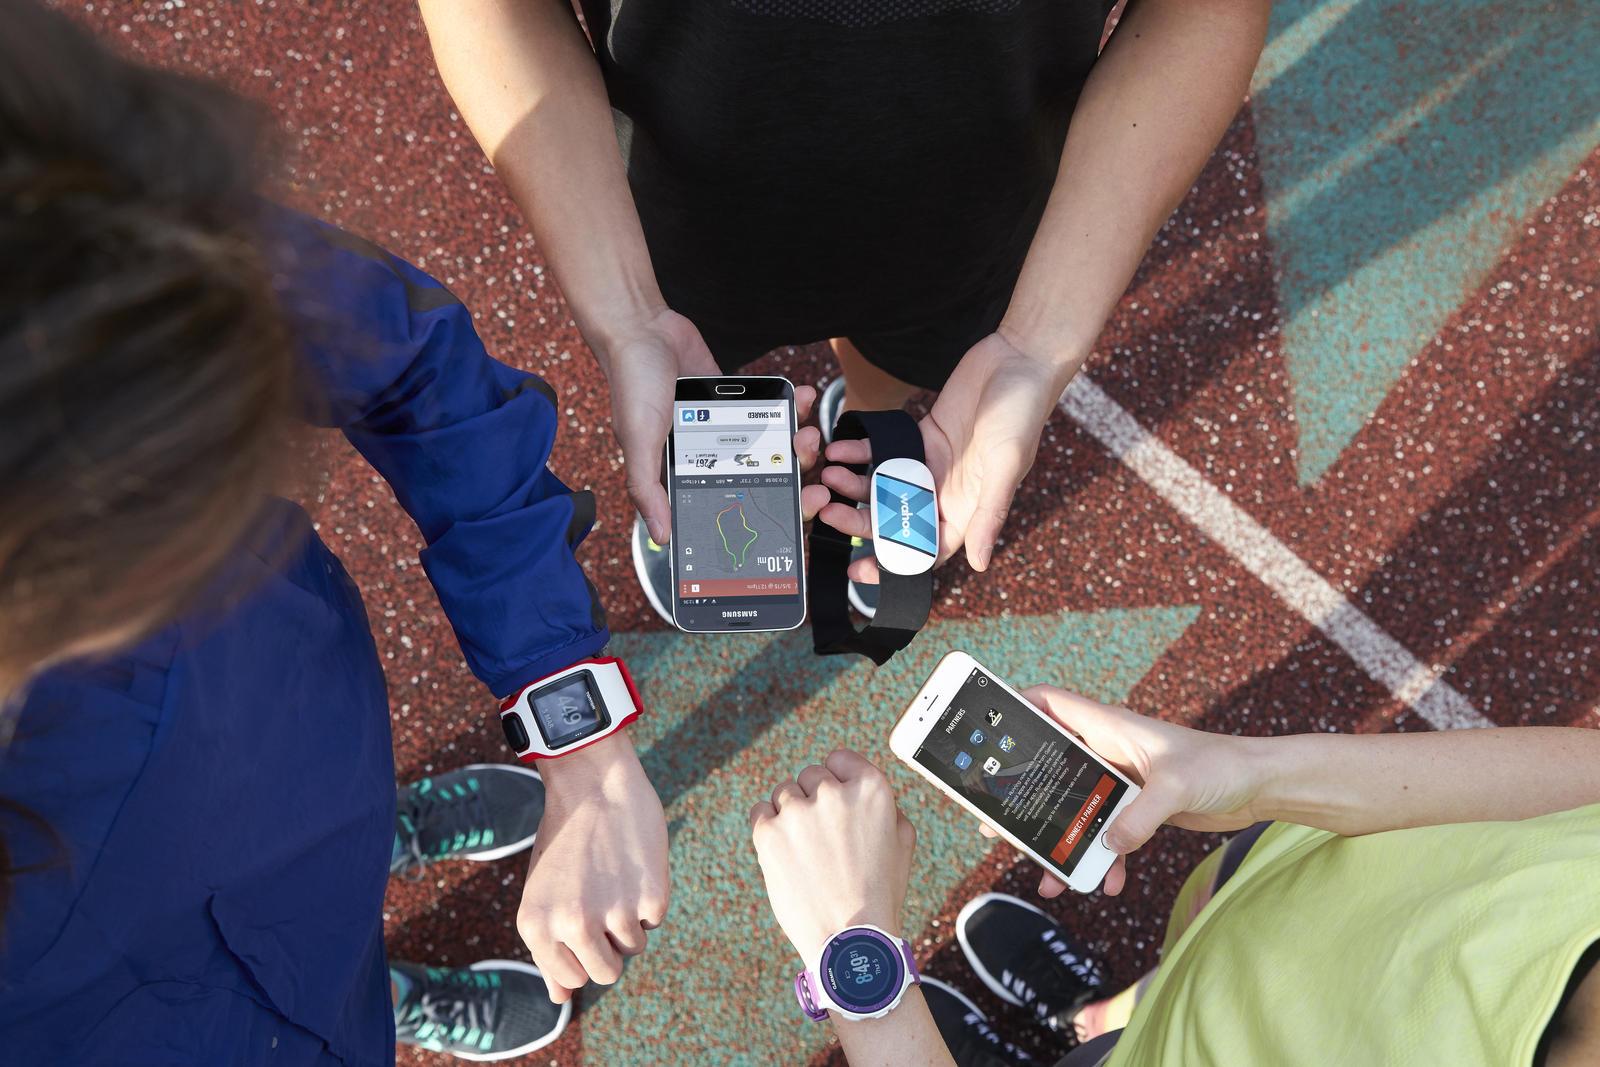 Aplicativo Nike+ agora sincroniza suas corridas marcadas no relógio